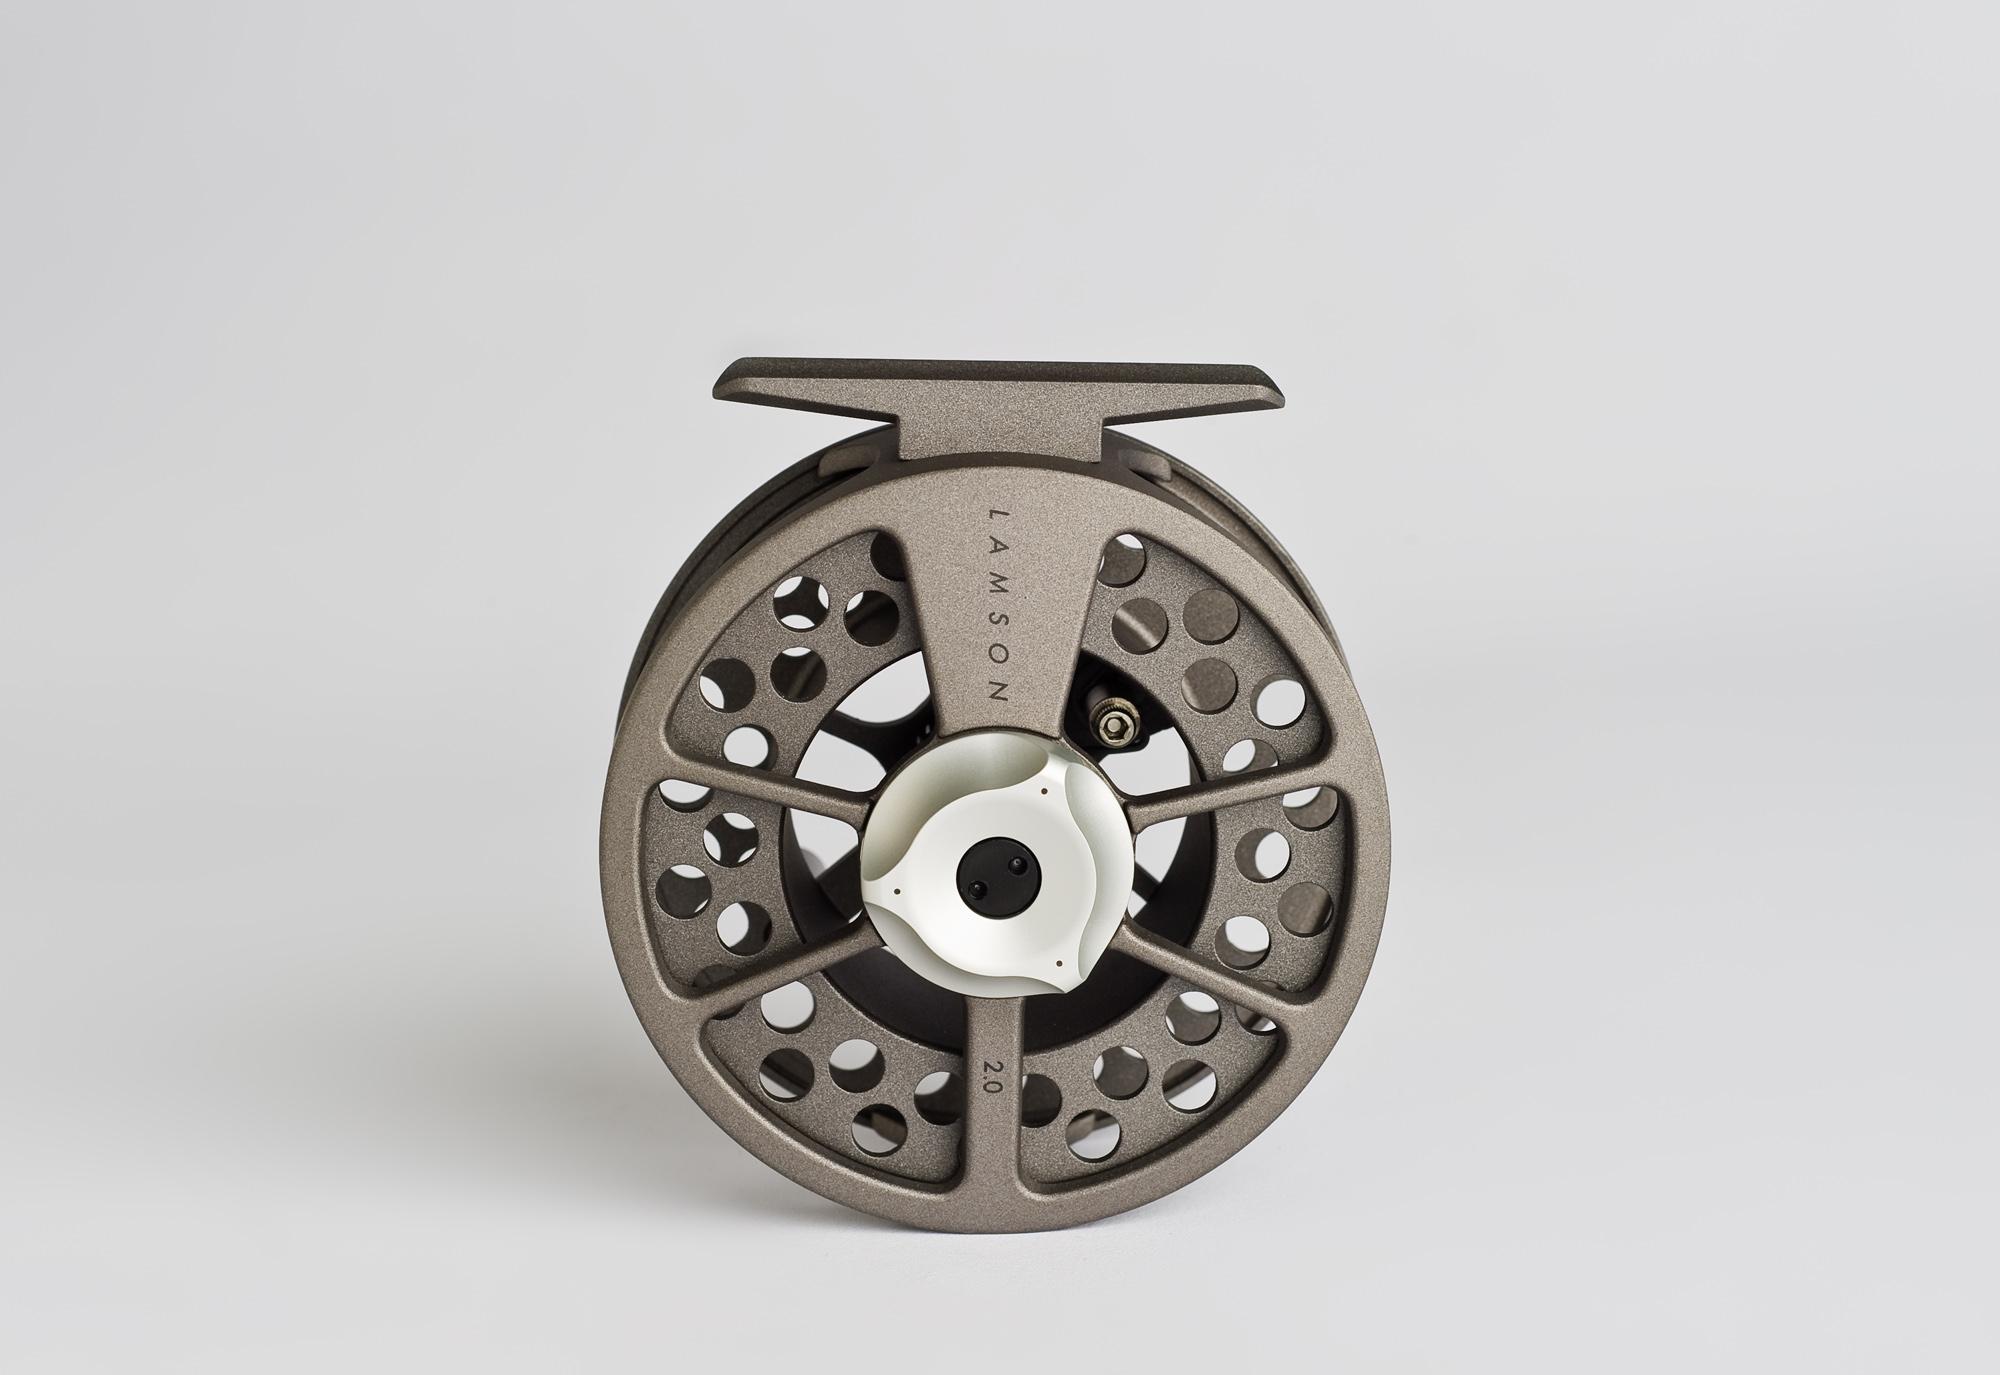 Lamson Konic Spare Spool Reels